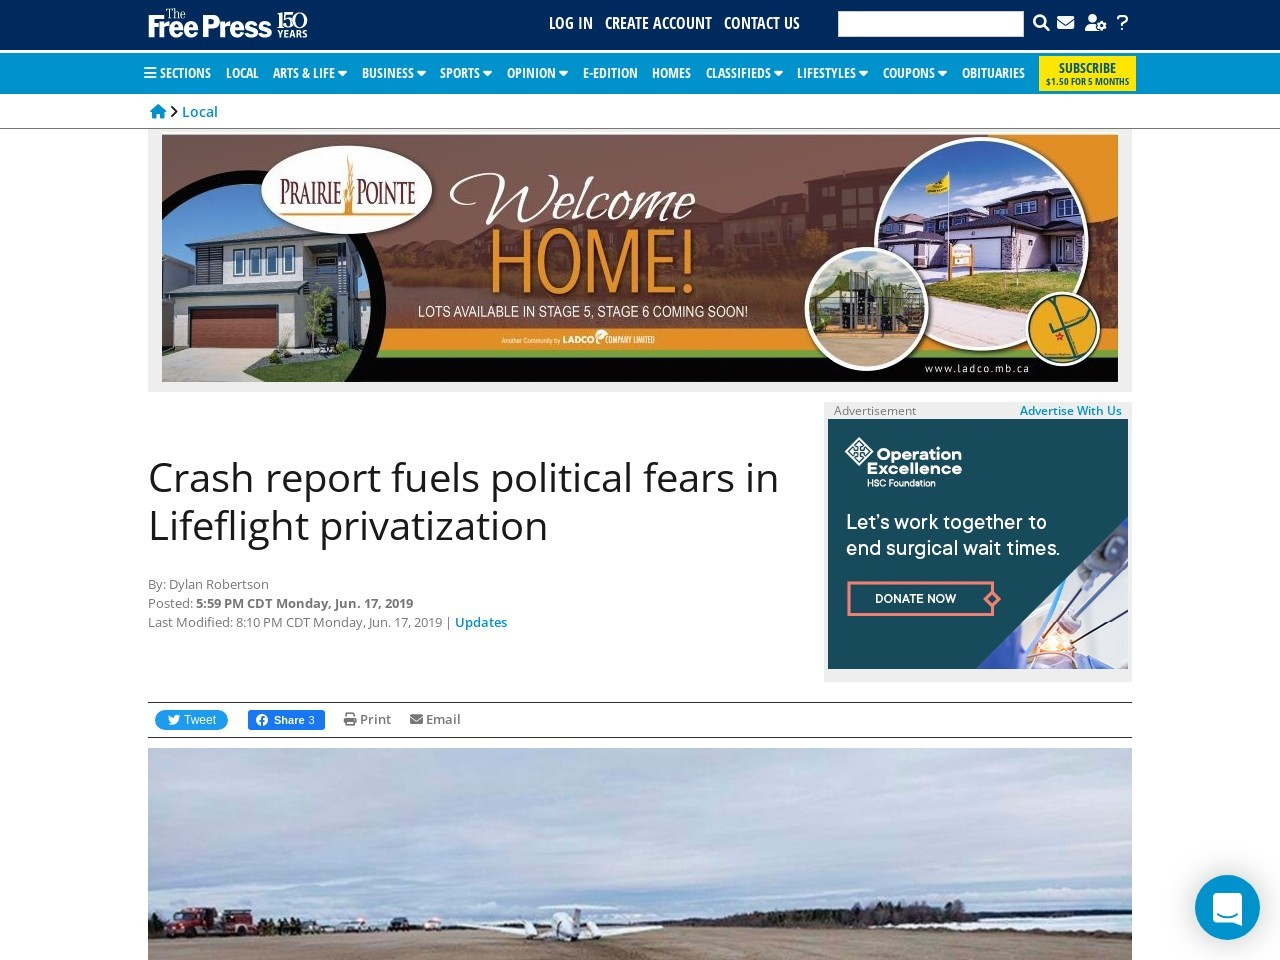 Crash report fuels political fears in Lifeflight privatization